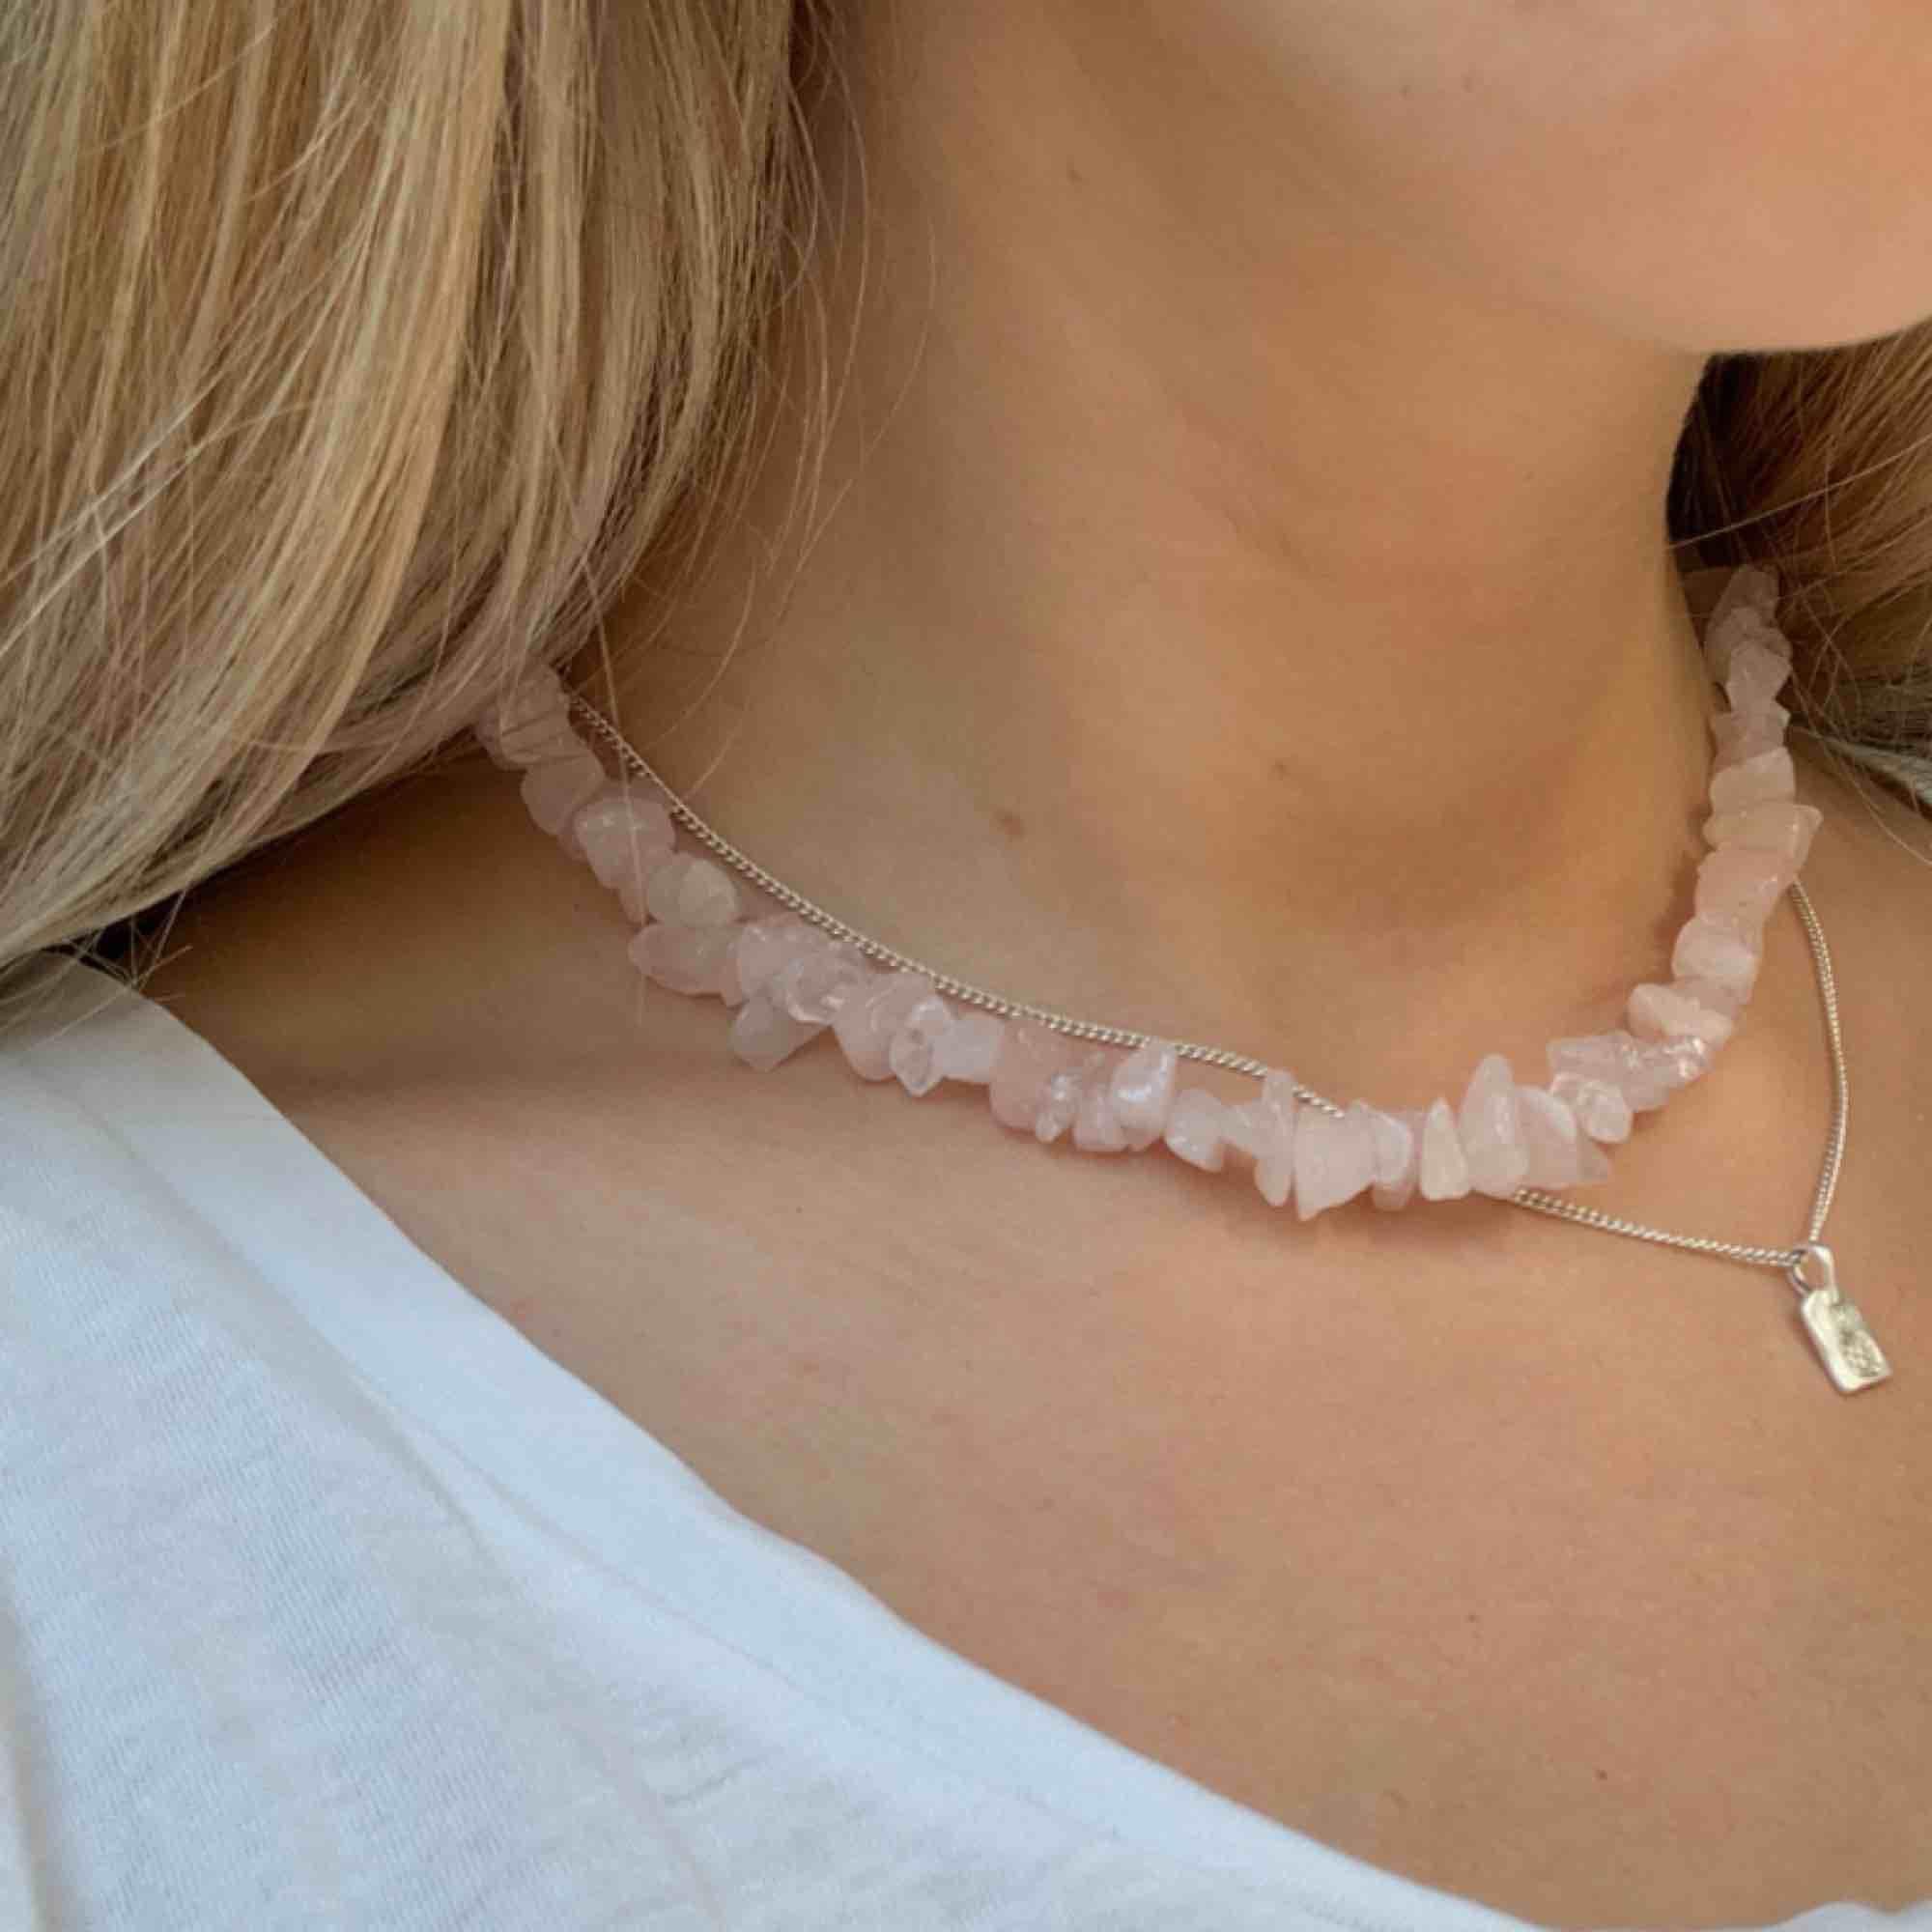 Rosenkvarts halsband💘 Elastisk tråd. Frakt 10kr. Instagram: @byviolajewelry . Accessoarer.